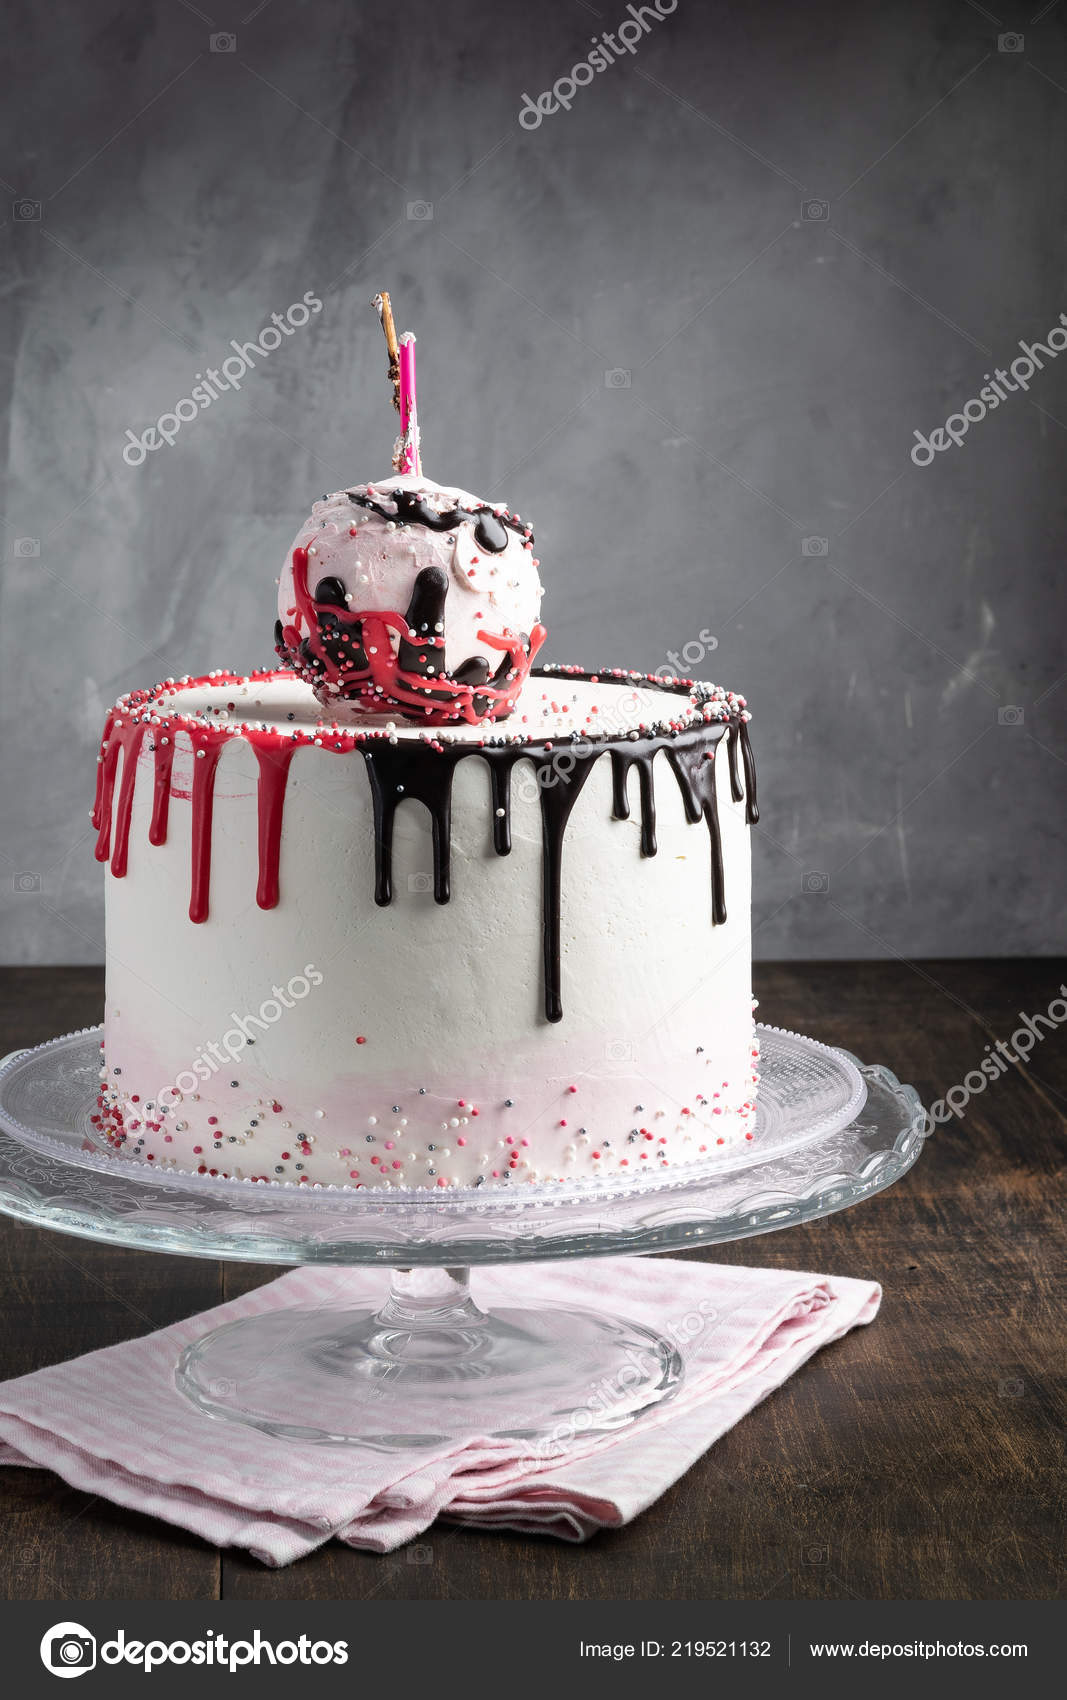 Marvelous Birthday Drip Cone Cake Sprinkles Gray Background Making Cake Personalised Birthday Cards Sponlily Jamesorg